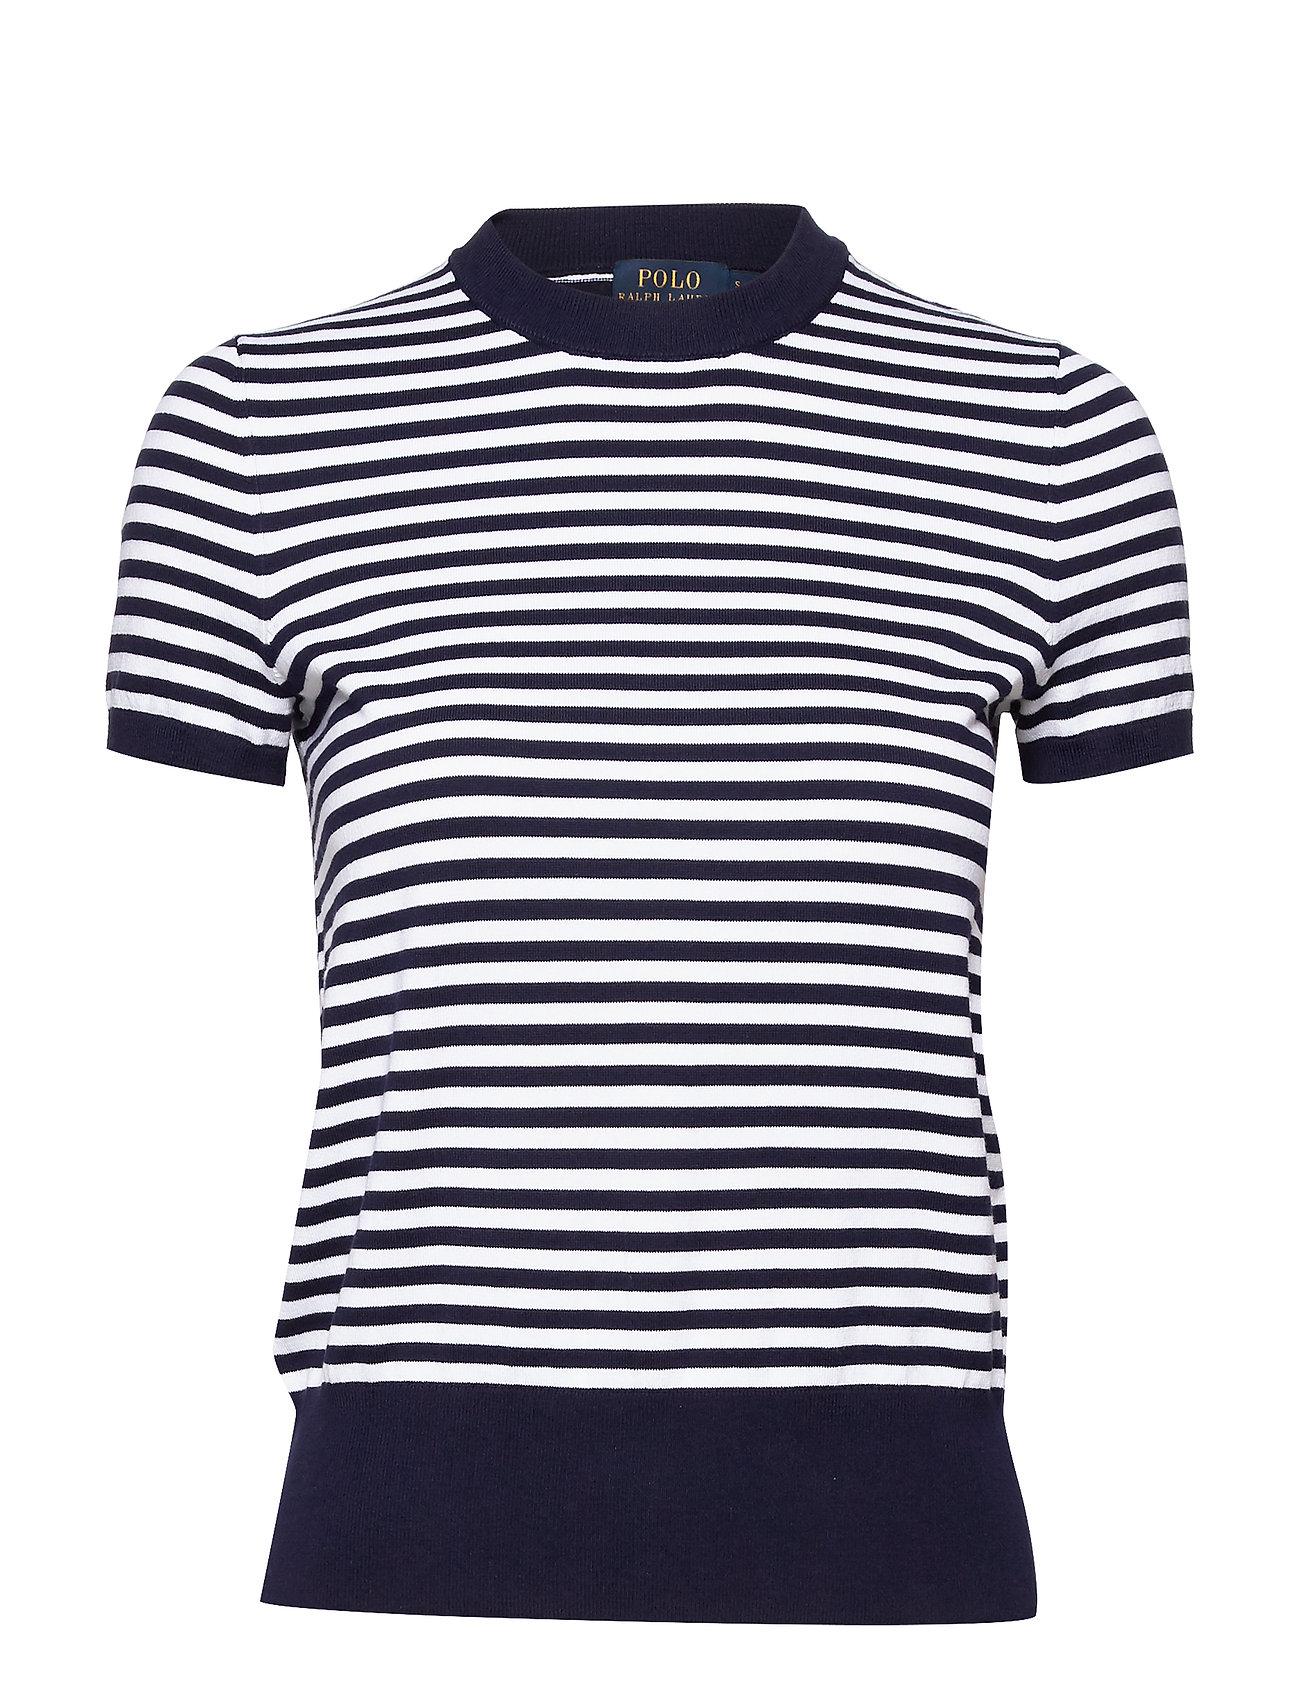 Polo Ralph Lauren Striped Short-Sleeve Sweater - BRIGHT NAVY/WHITE